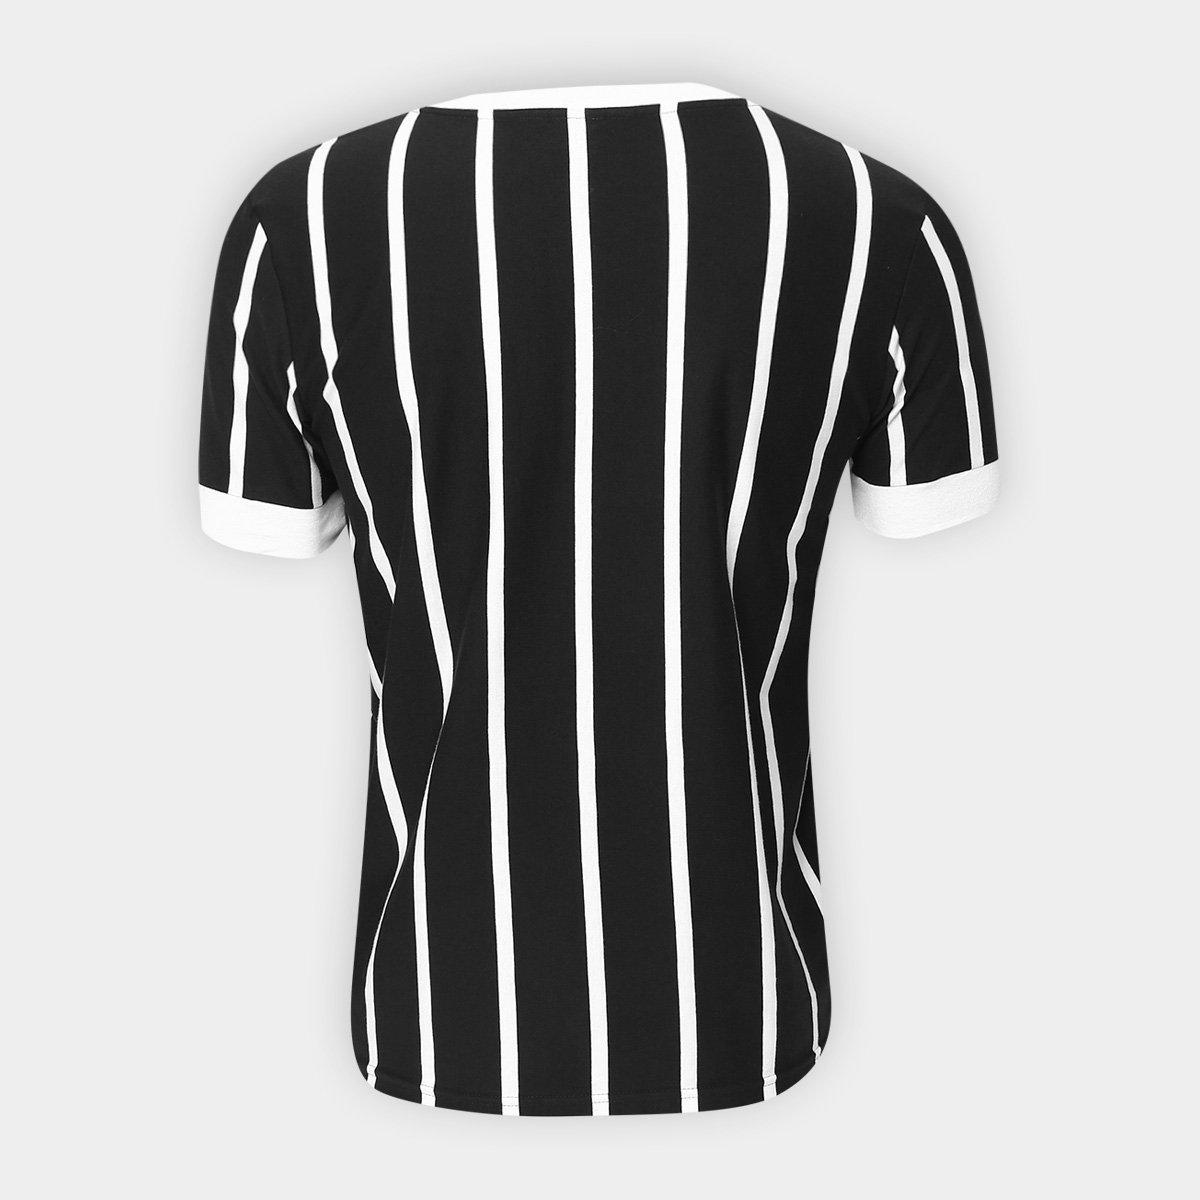 Camiseta Corinthians Réplica 1983 Masculina  Camiseta Corinthians Réplica  1983 Masculina ... cff52433a6a10